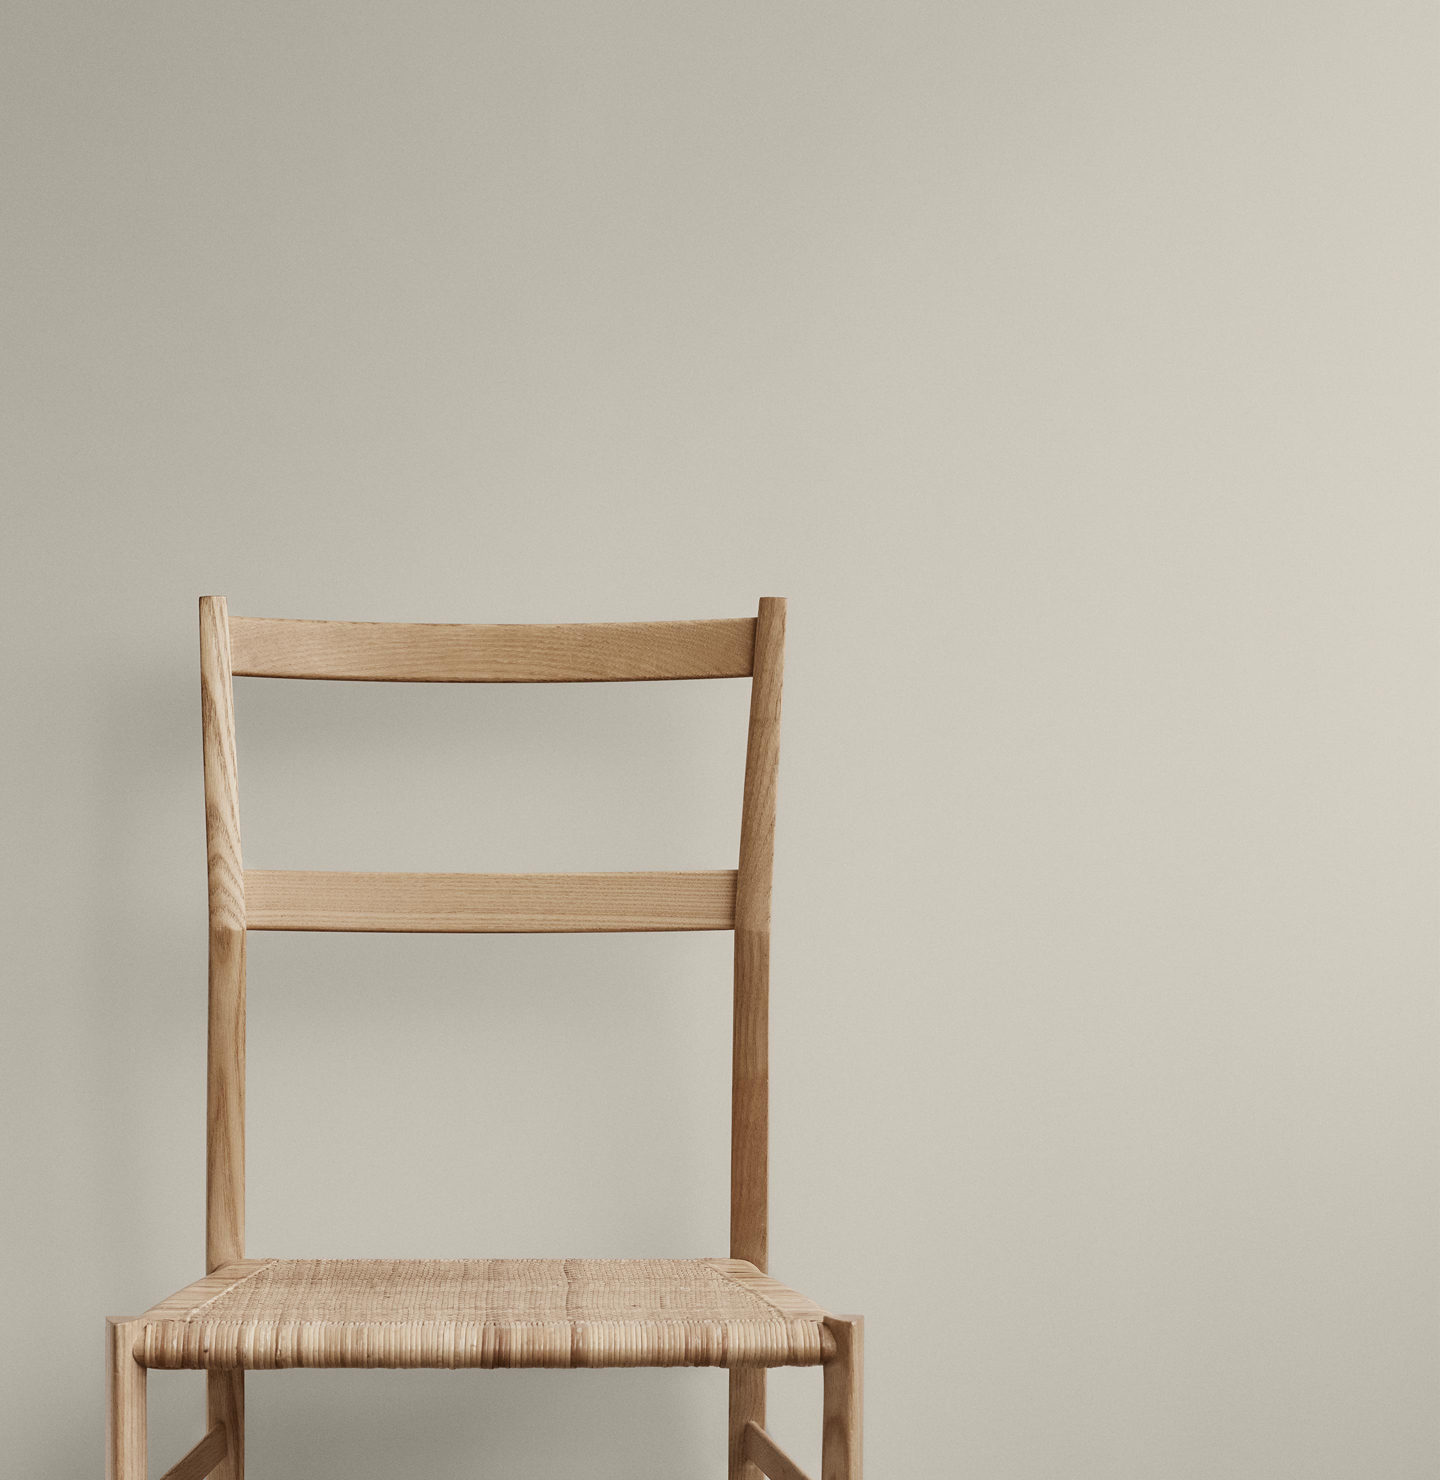 'Sheer Grey' from Jotun, IMAGE CREDIT: Jotun